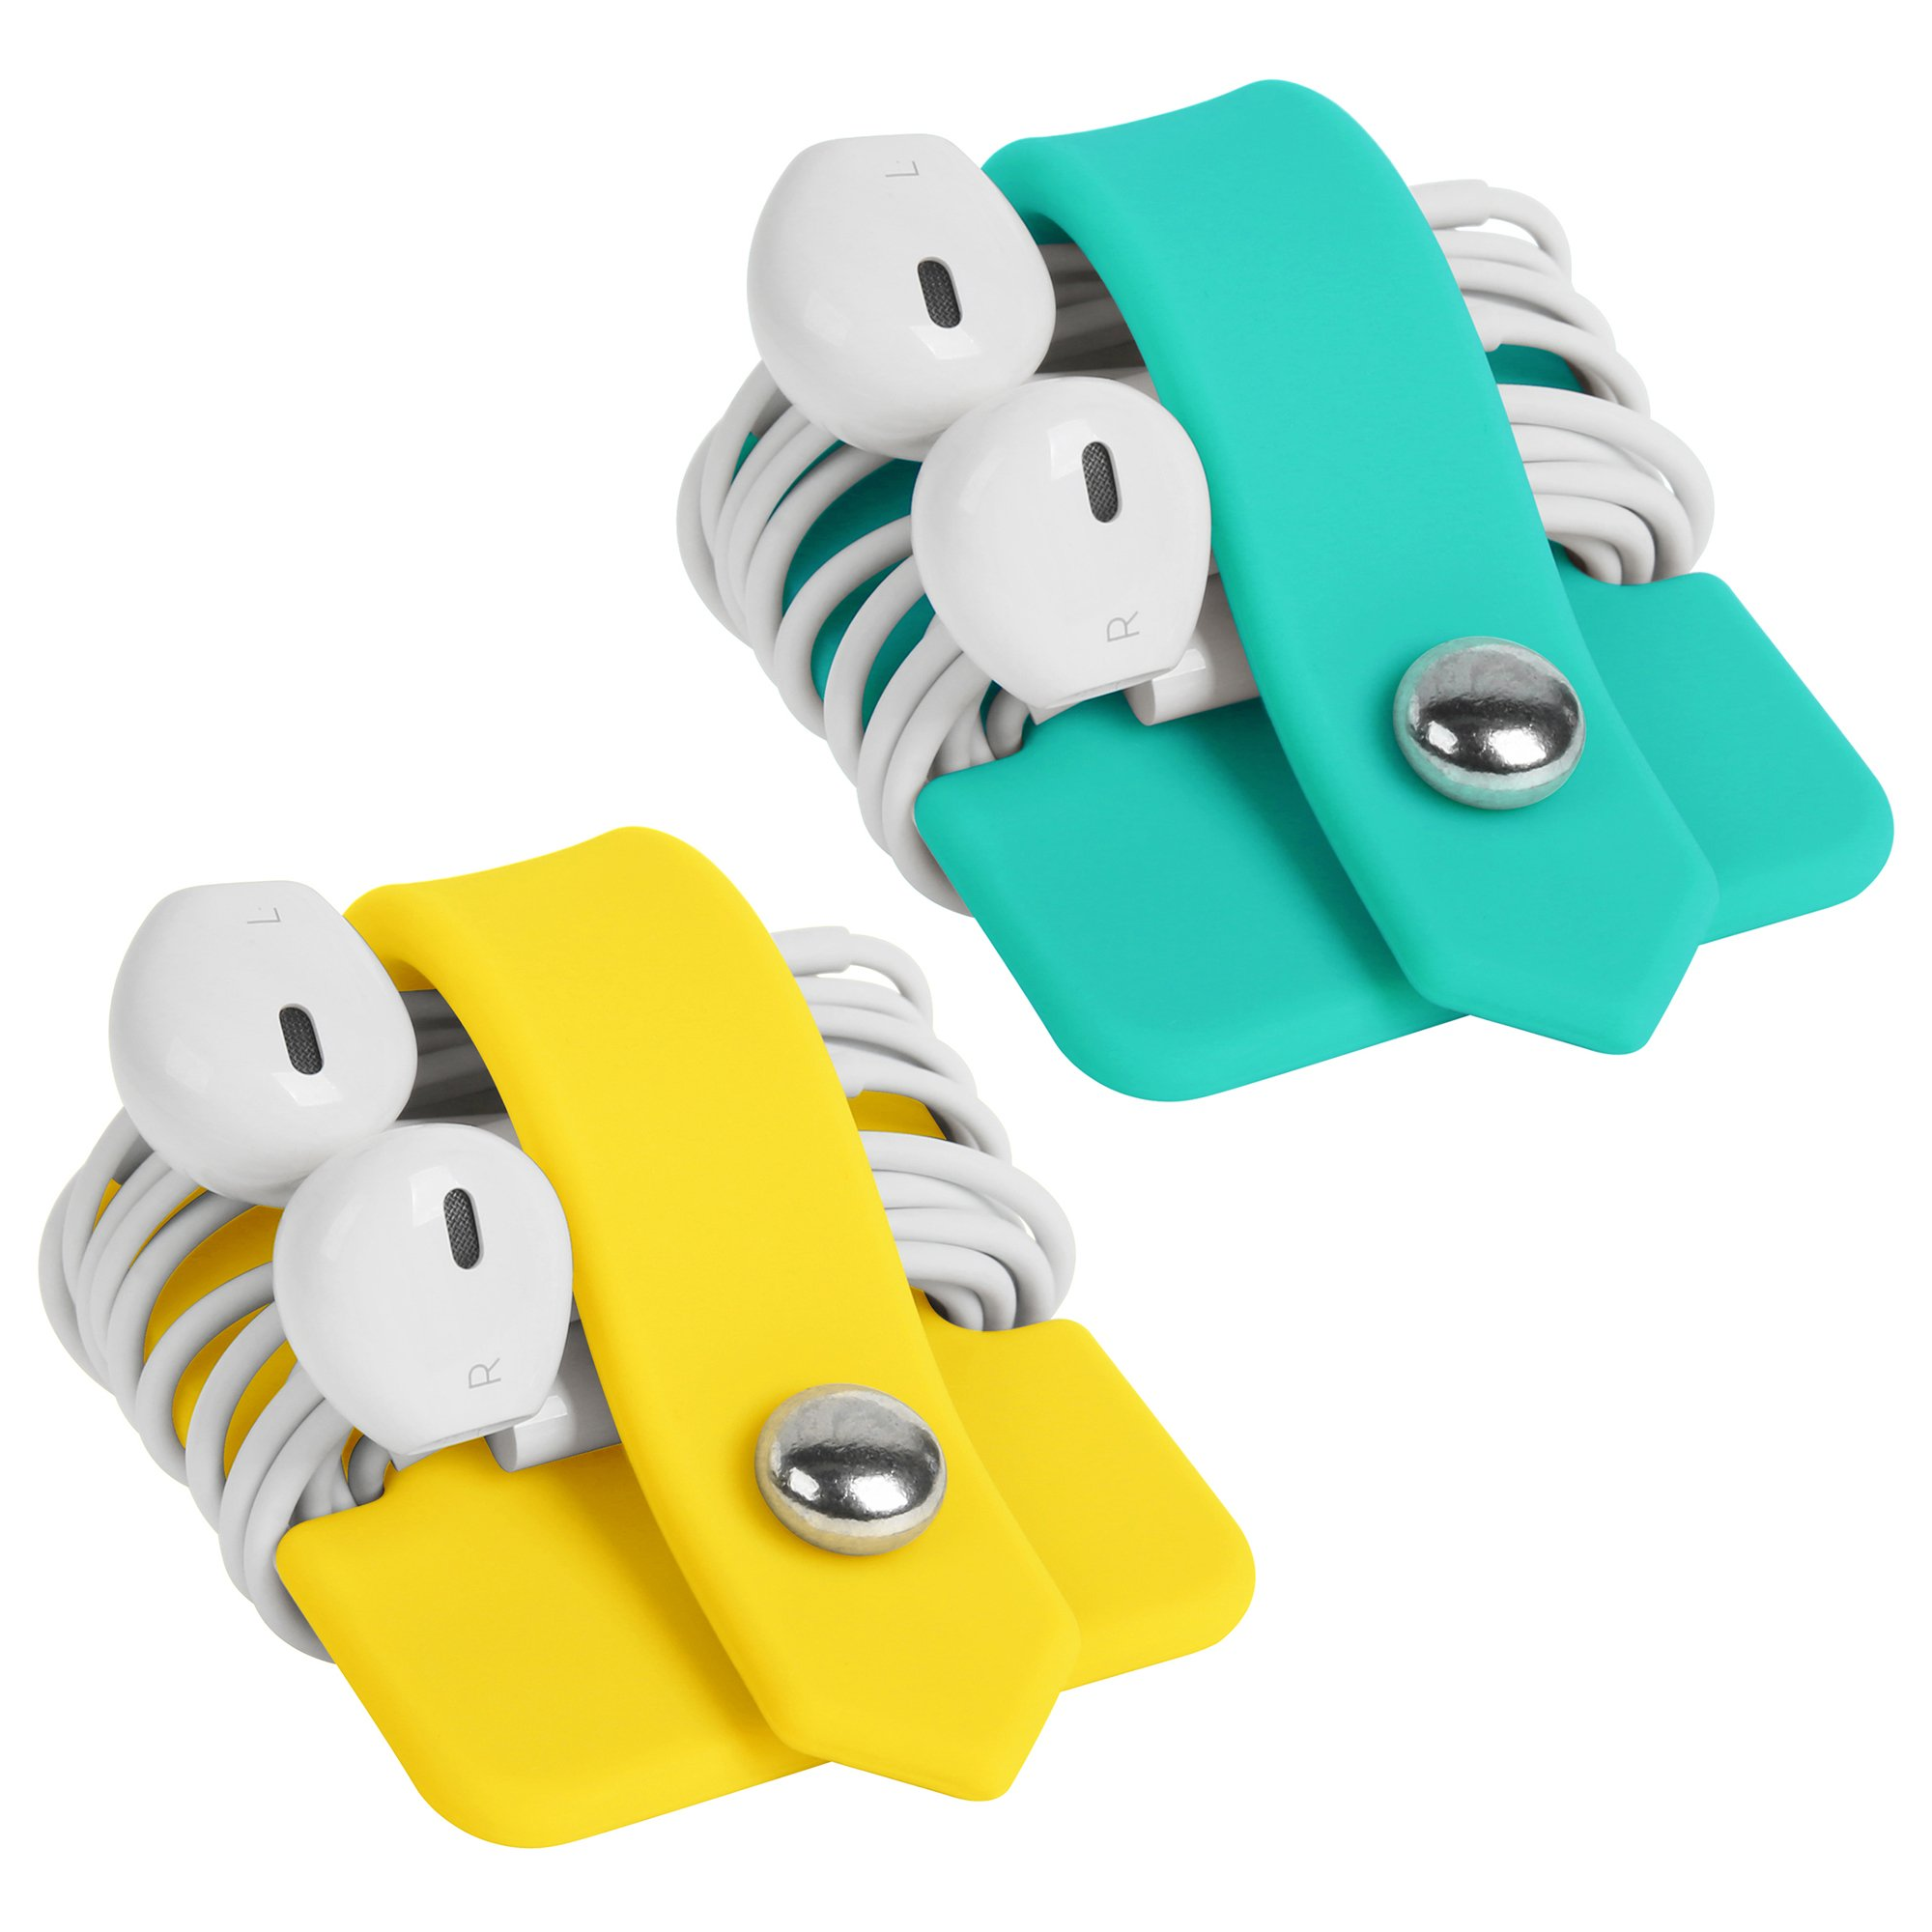 ELFRhino Silicone Earphone Organiser Earphone Wrap Winder Headphone Cord Organiser Wrap Winder Manager/Cable Winder Tiffany